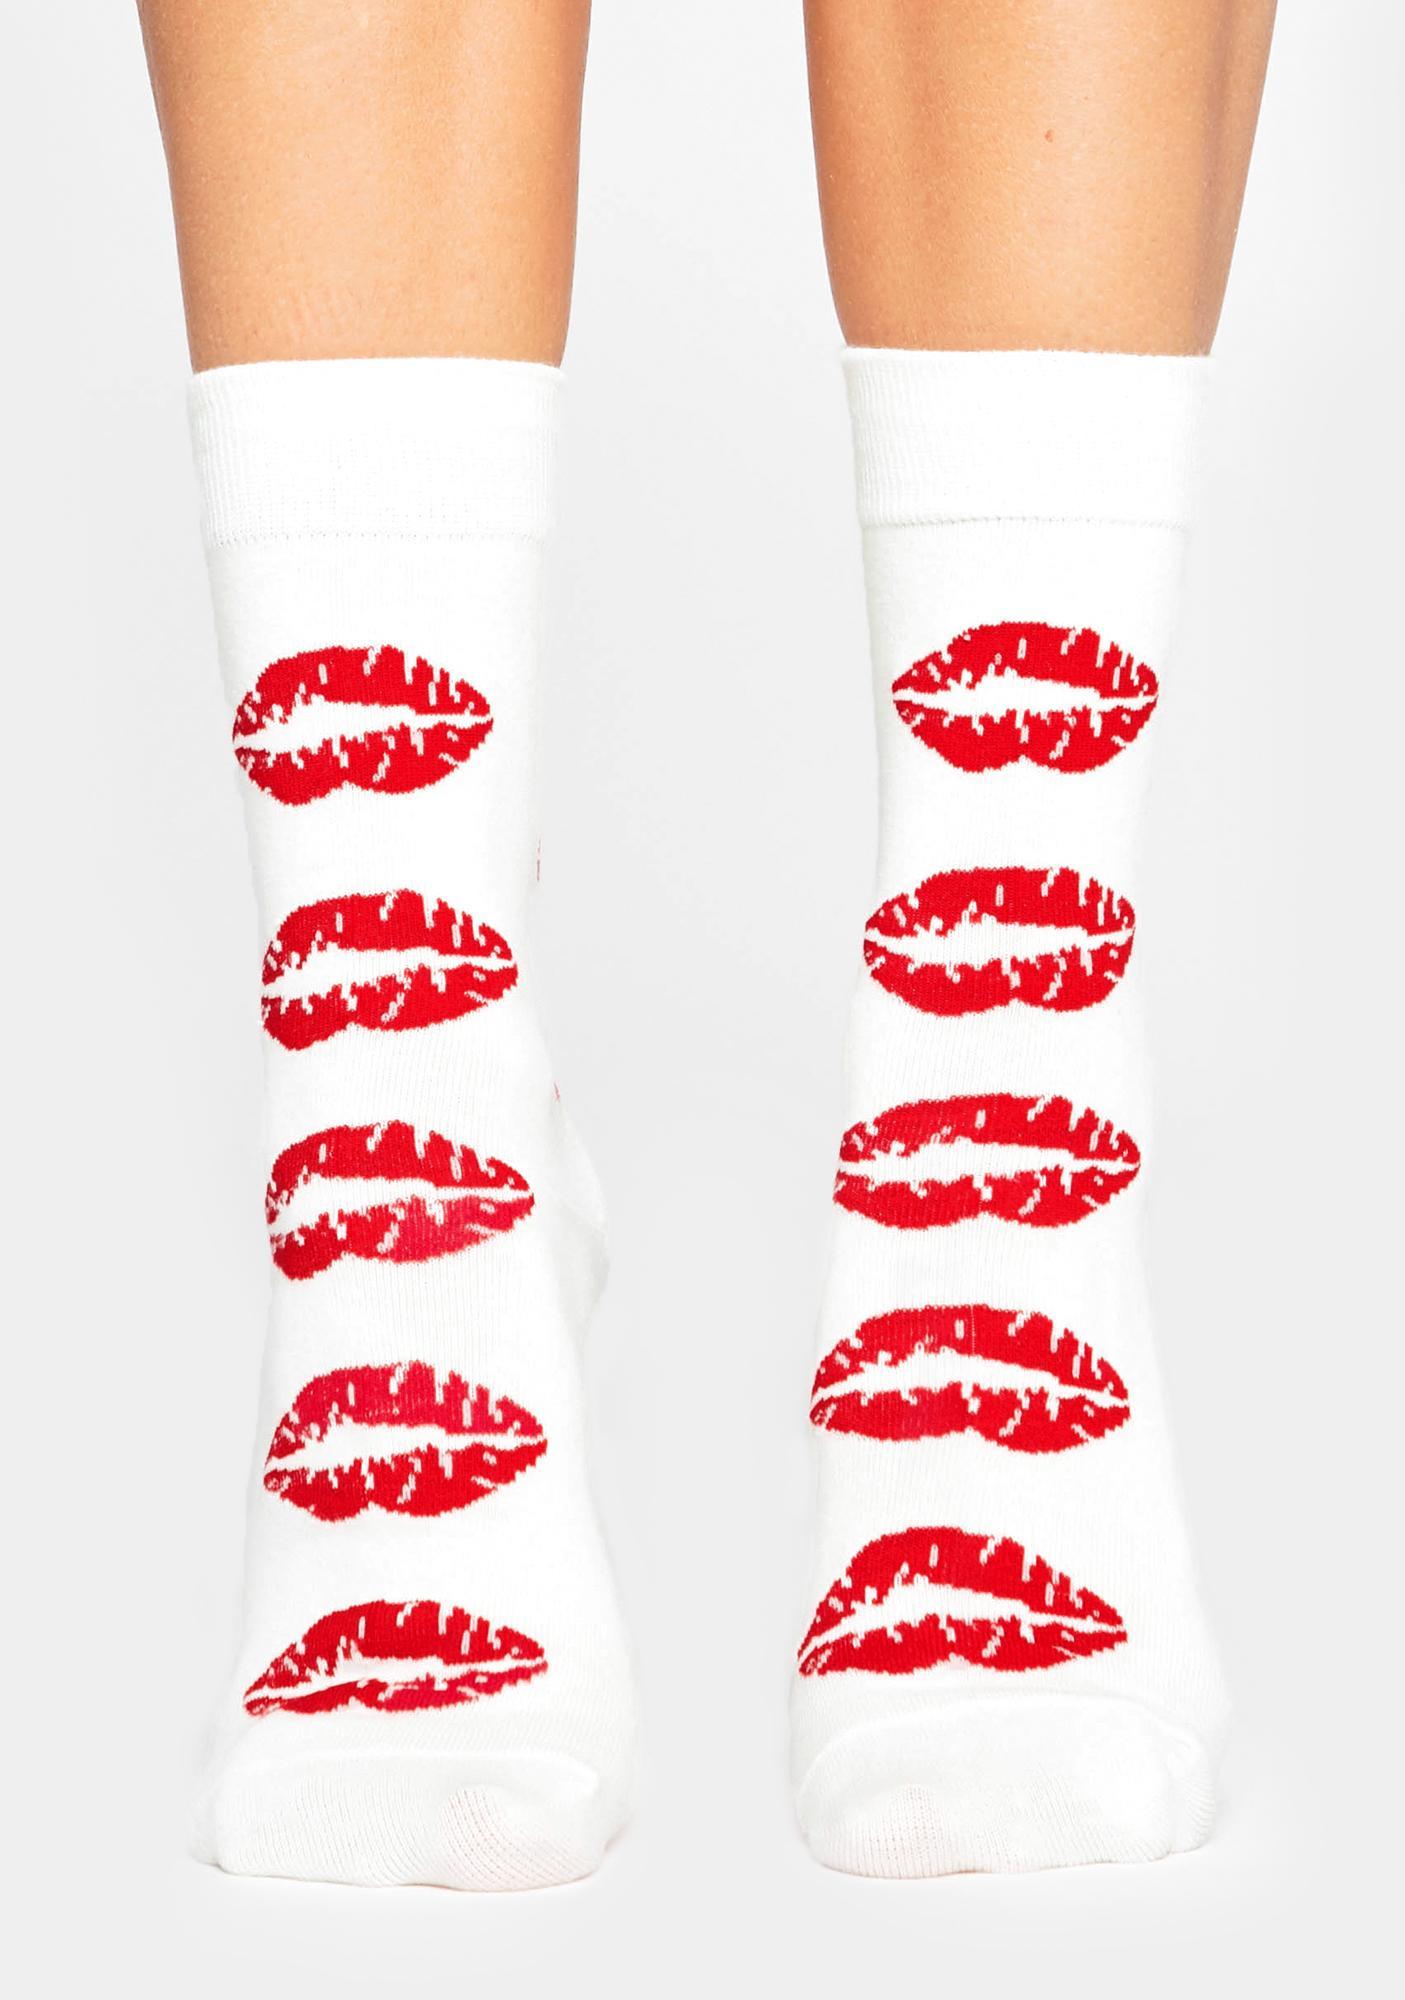 Makeout Sesh Crew Socks